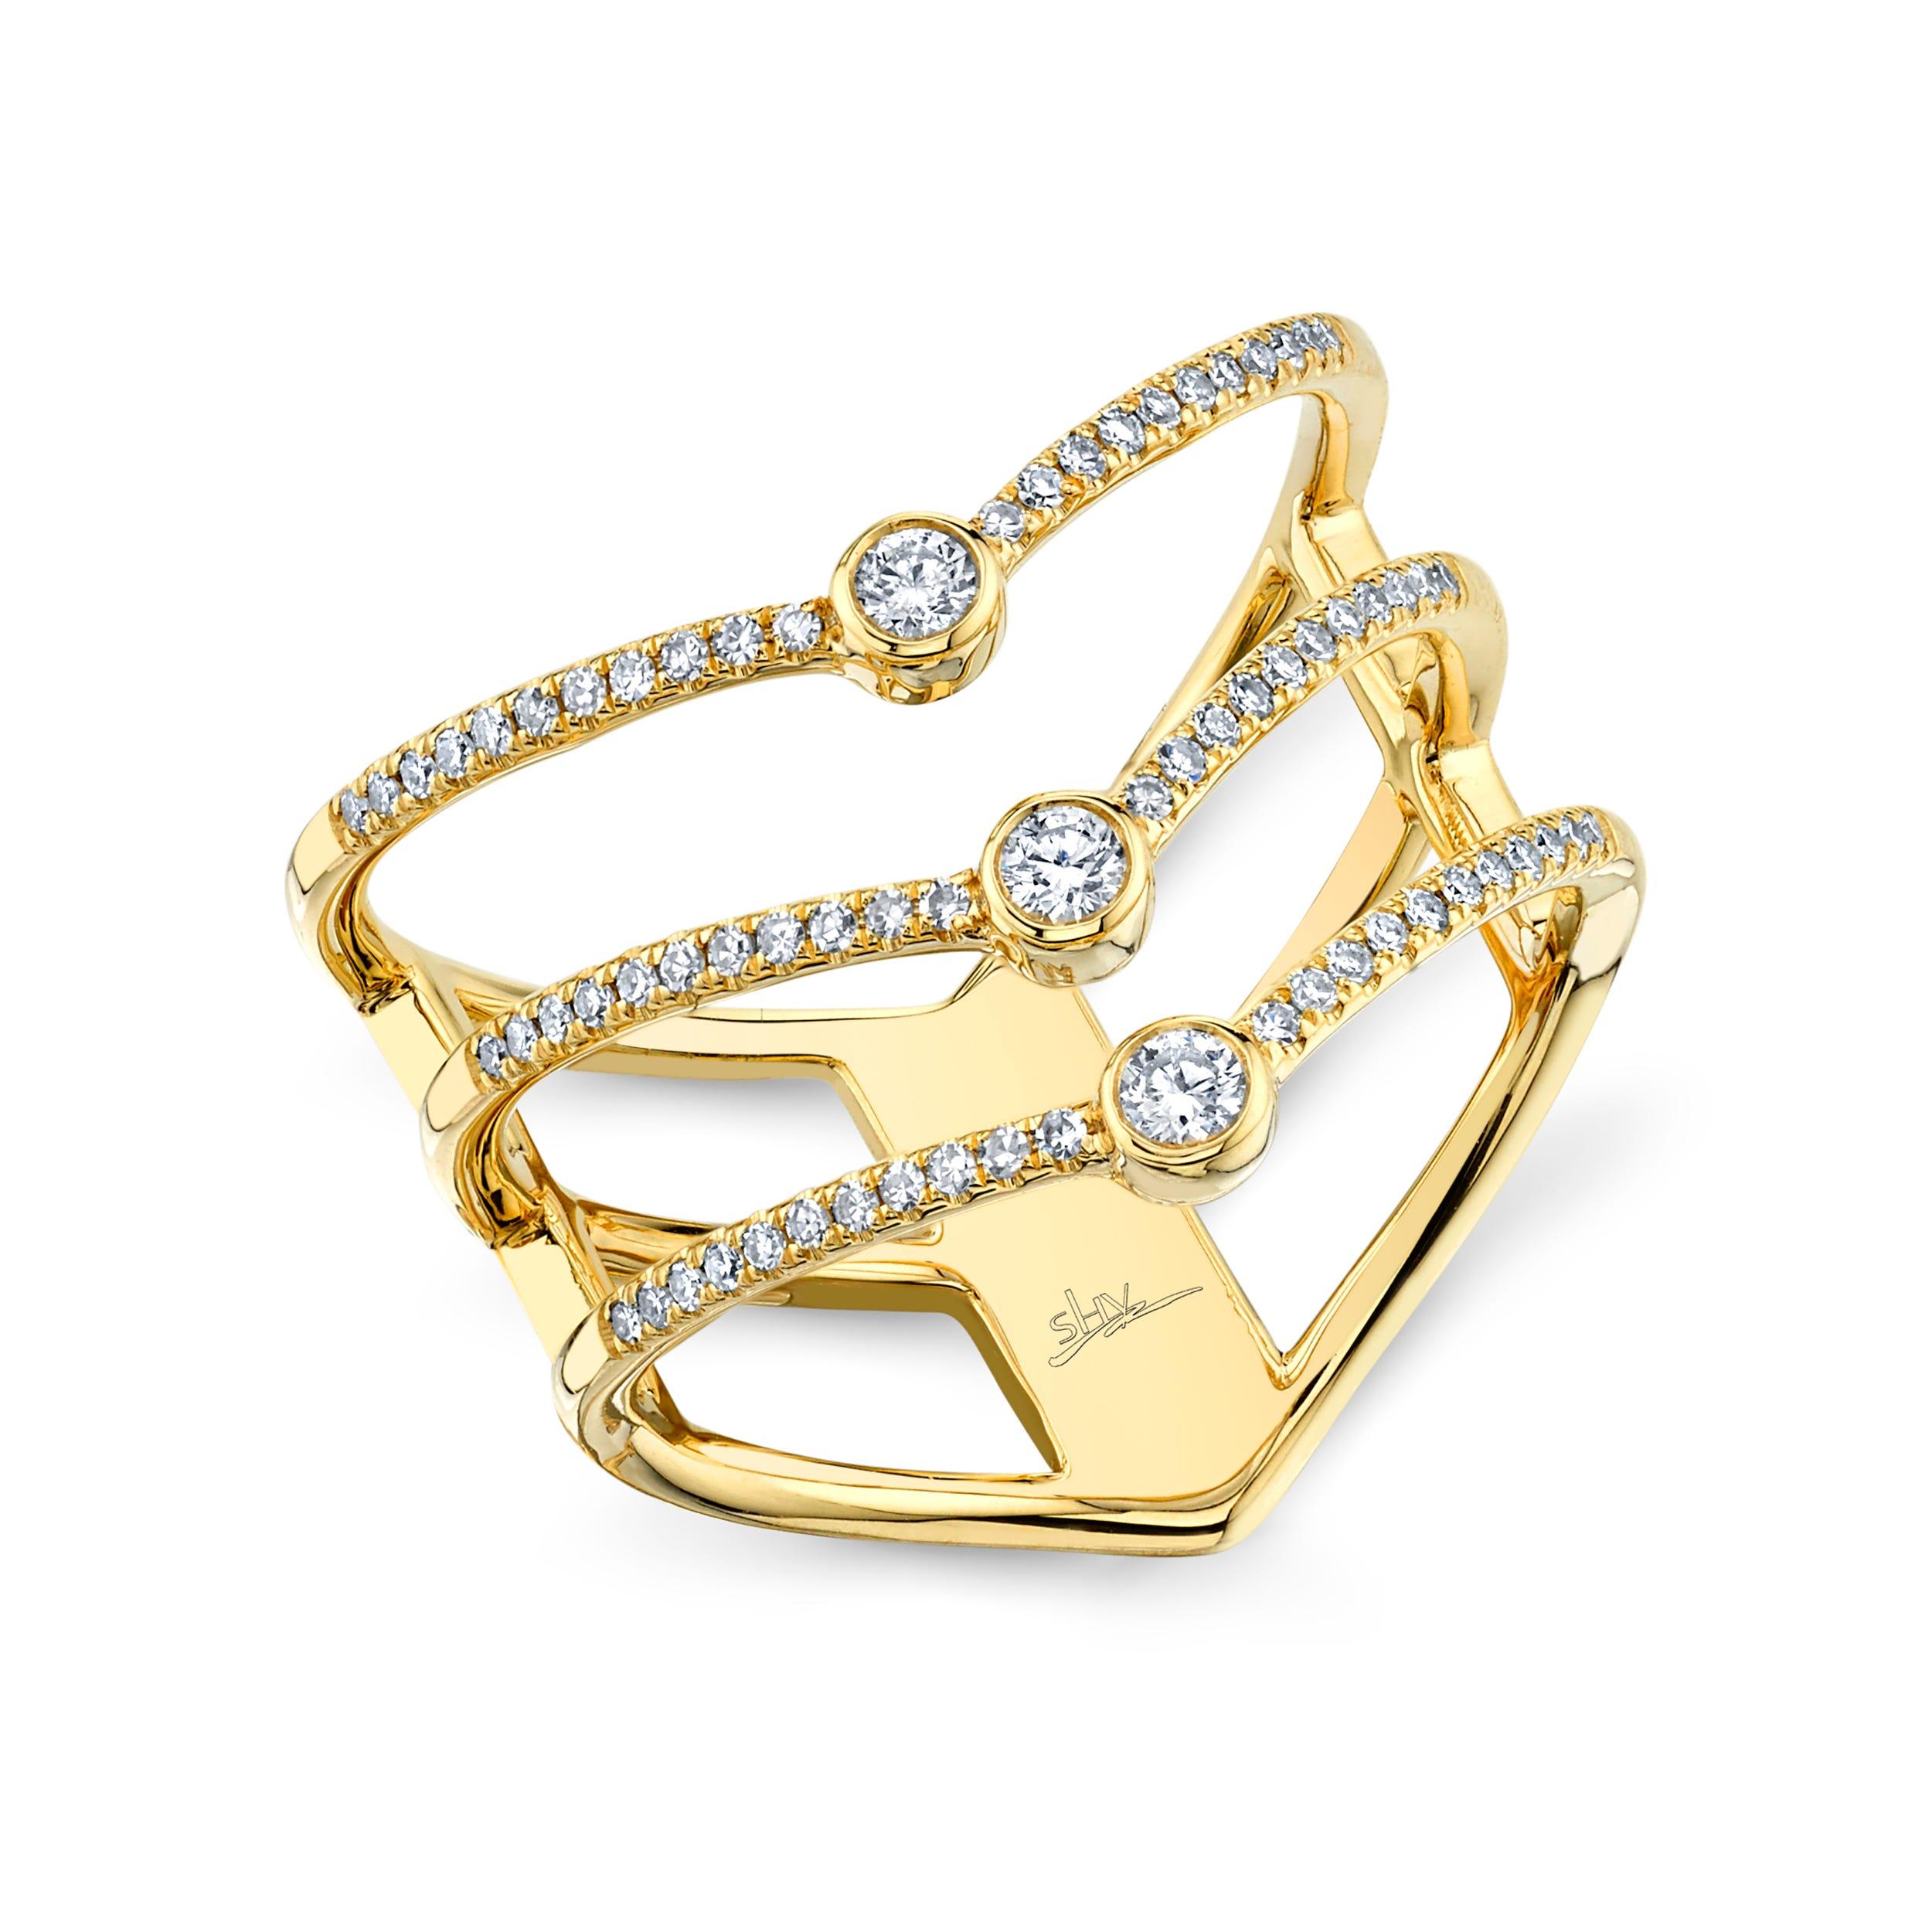 Shy Creation  3 Row Diamond Fashion Ring 14k Yellow Gold SC55001617